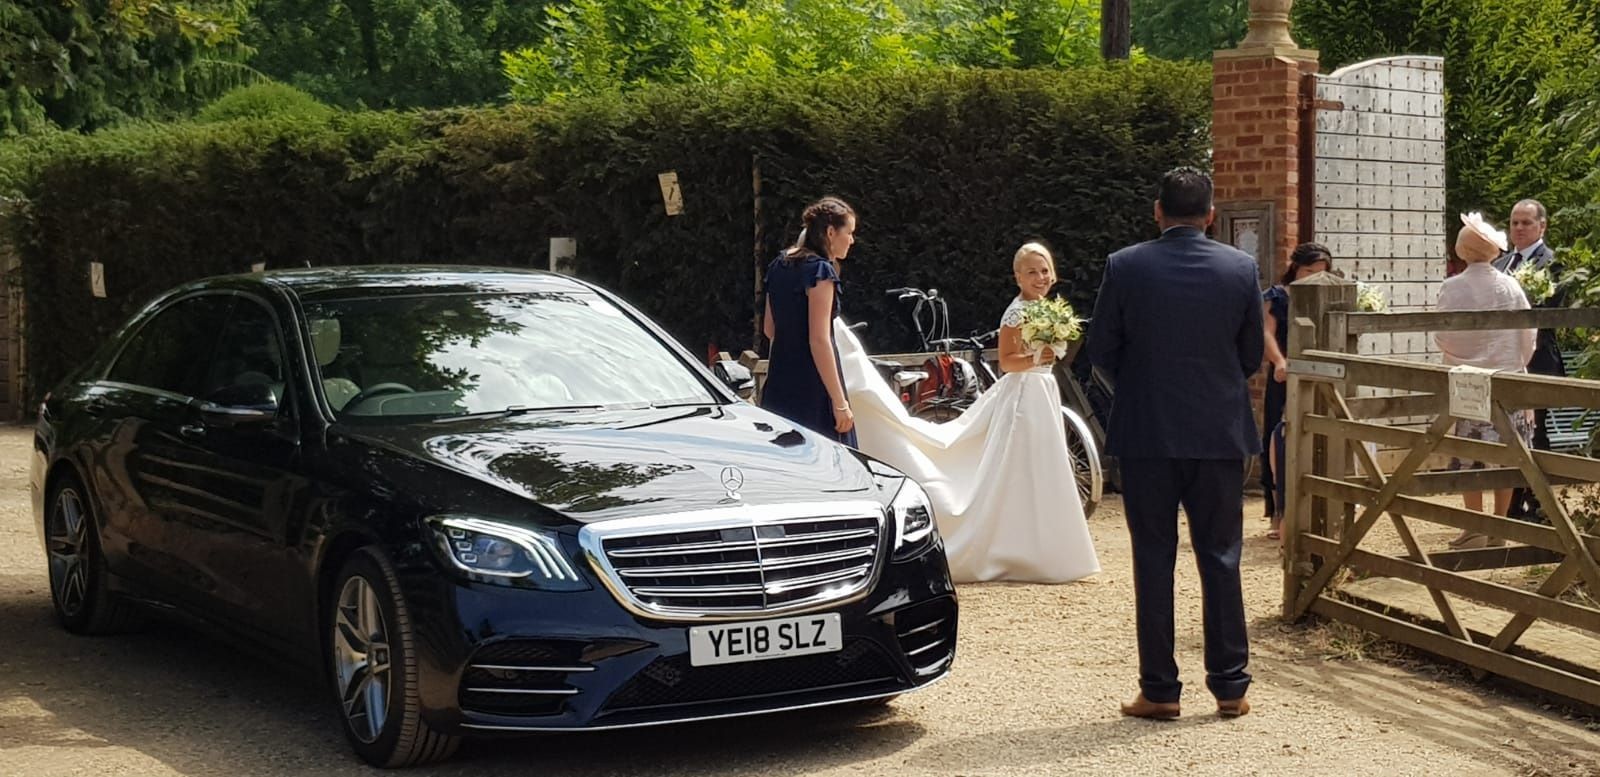 s class wedding 1.jpg